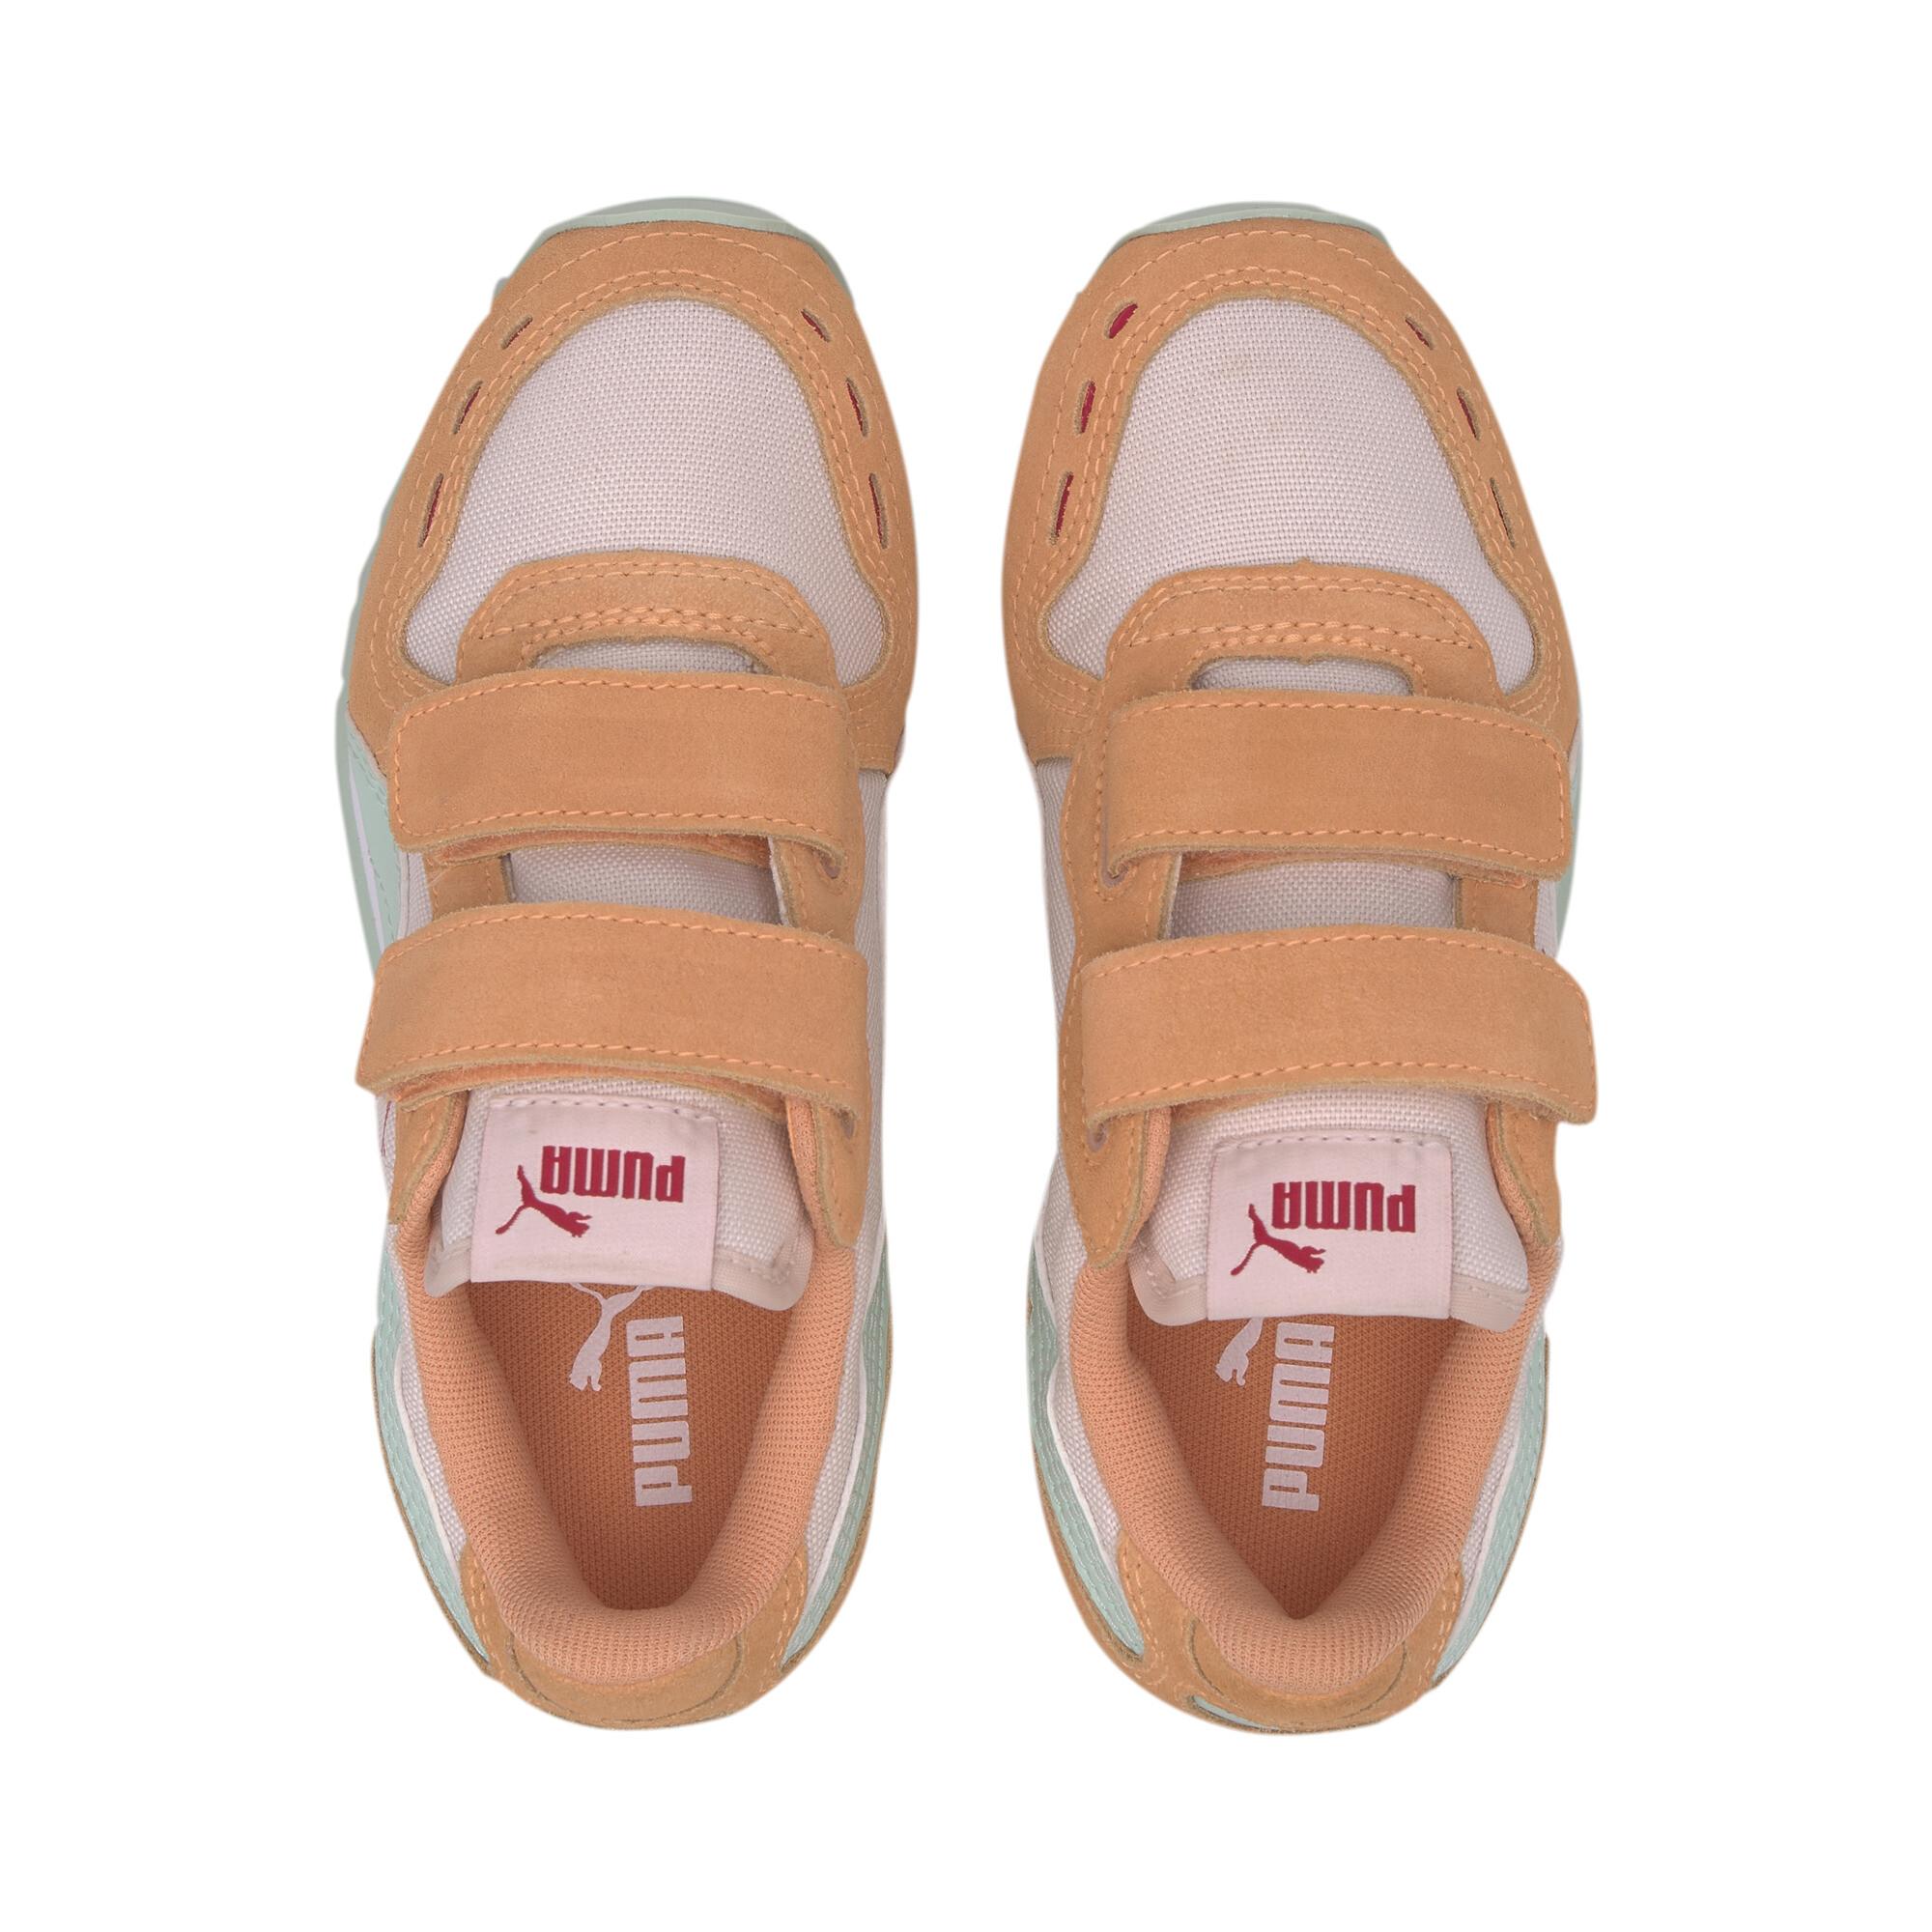 PUMA-Cabana-Racer-Little-Kids-039-Shoes-Kids-Shoe-Kids thumbnail 24